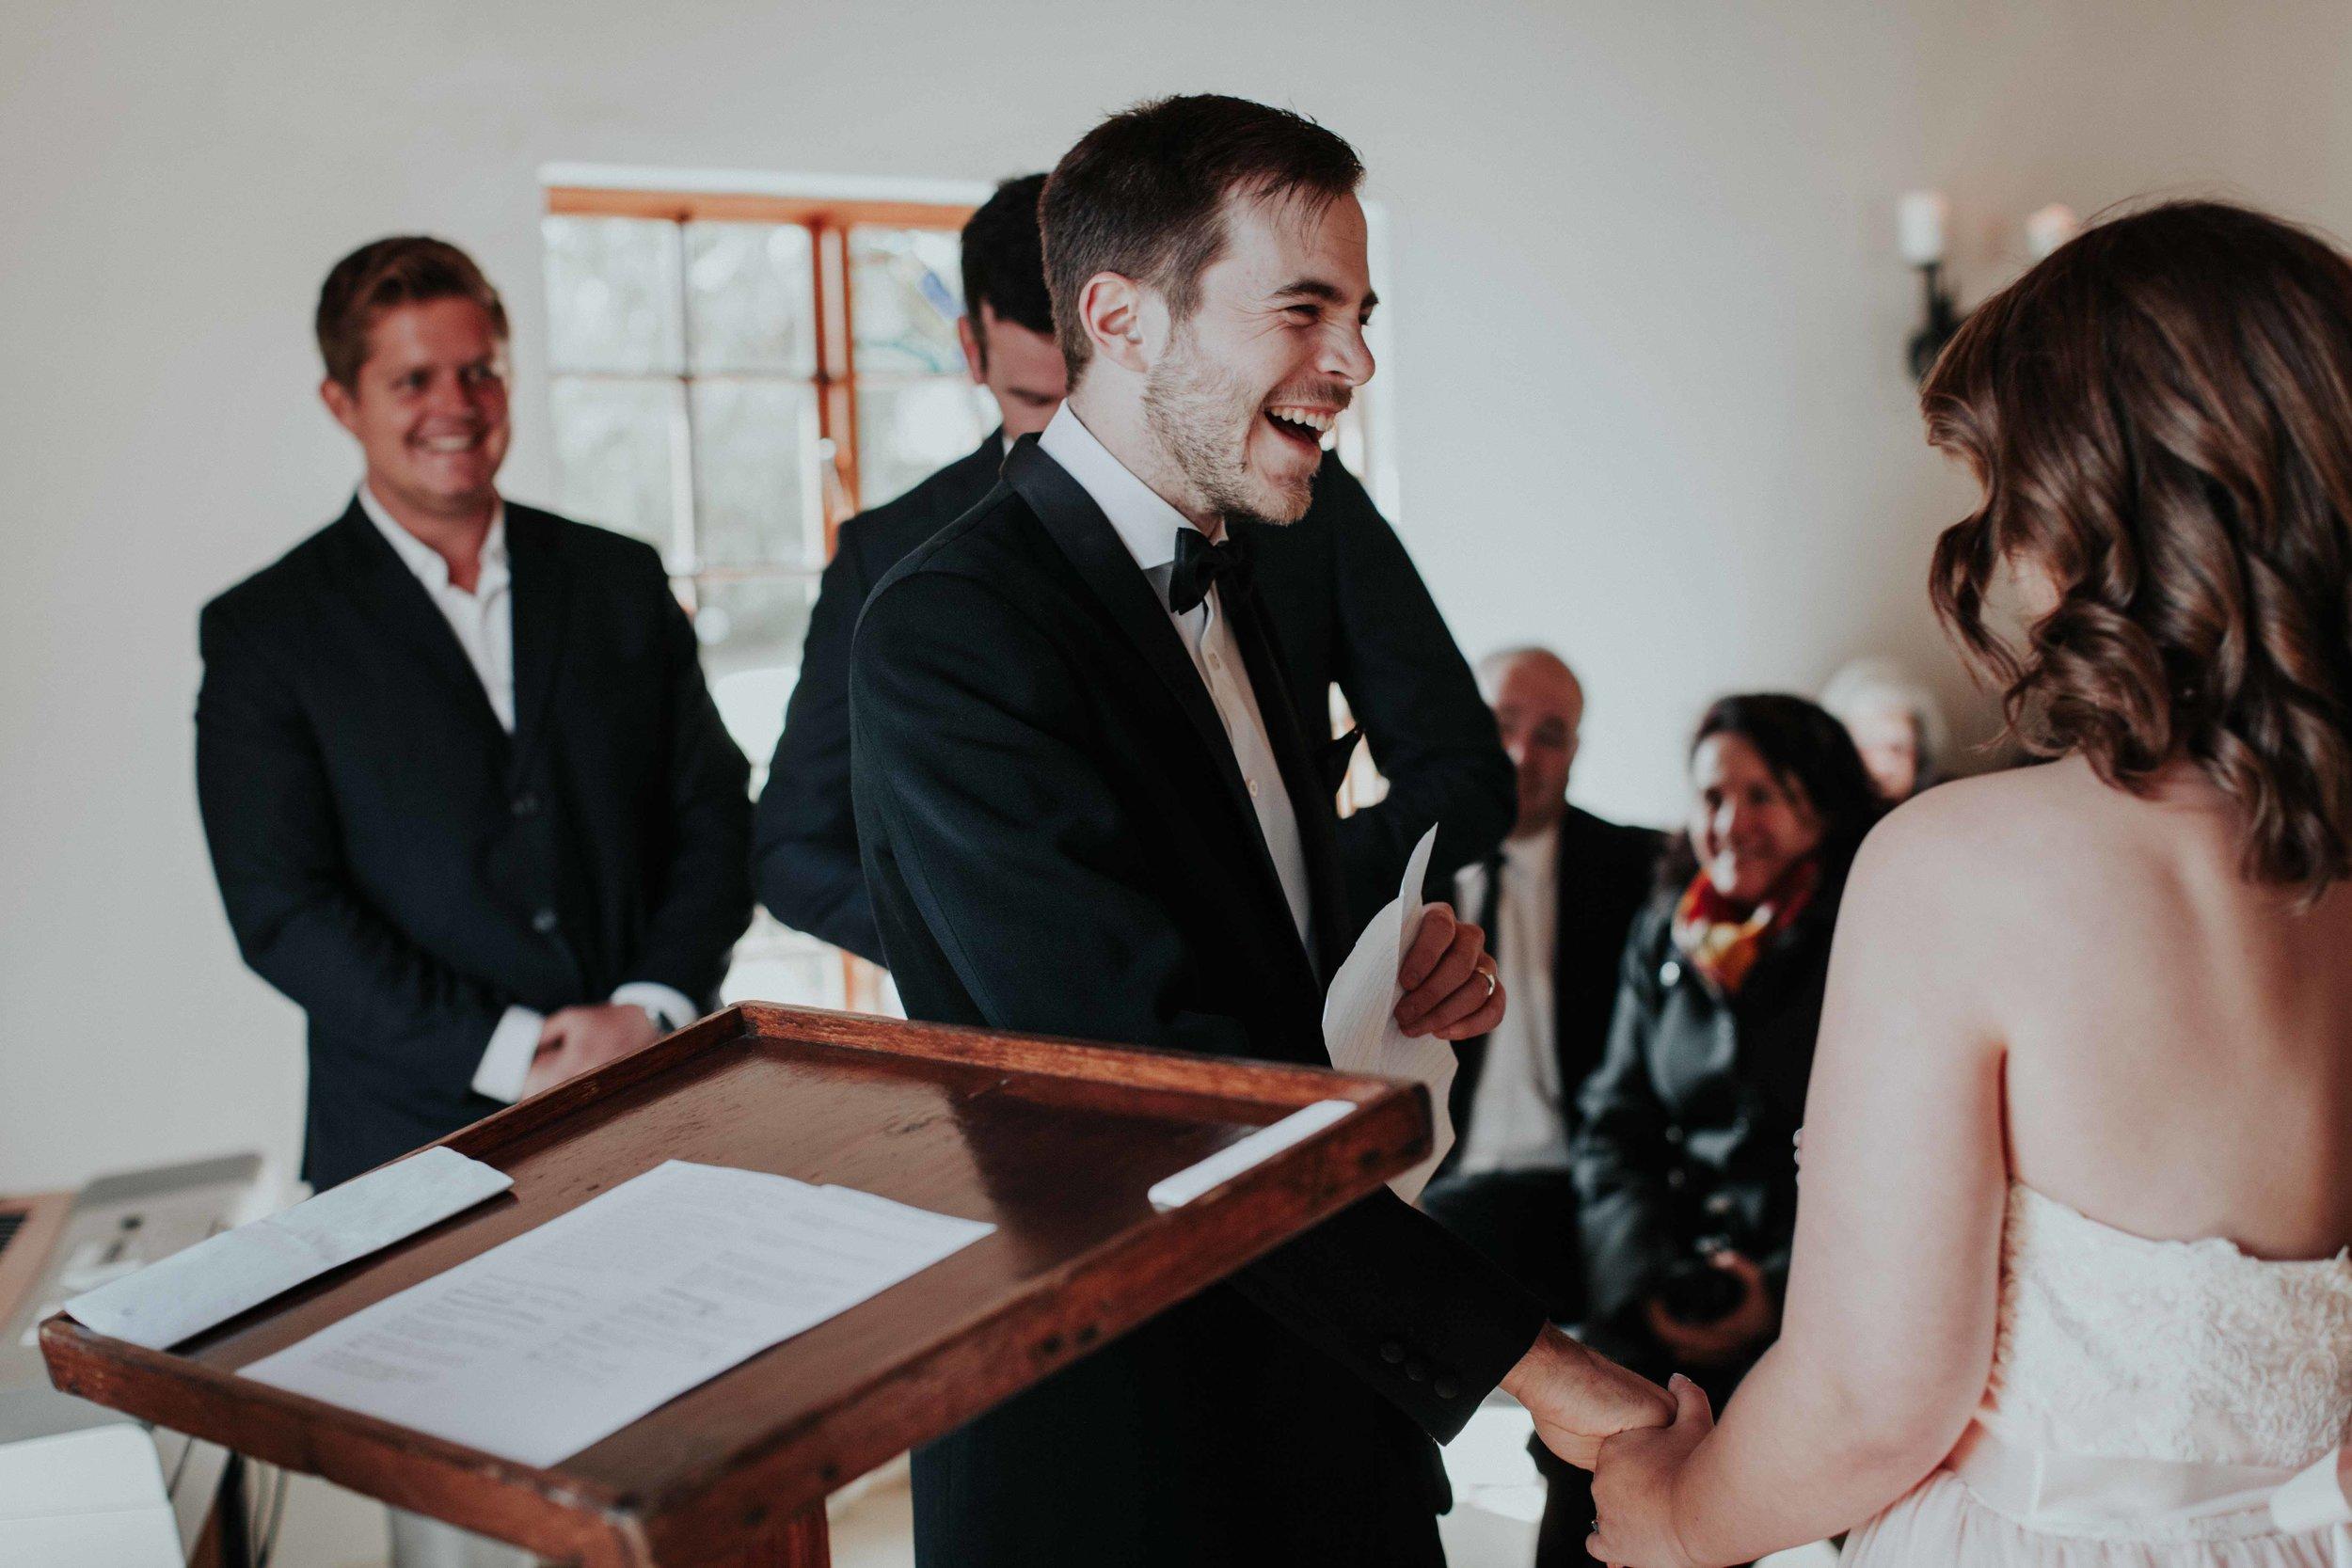 Kristi Smith Photography - Wedding Photography - Darryl & Meg 6.jpg